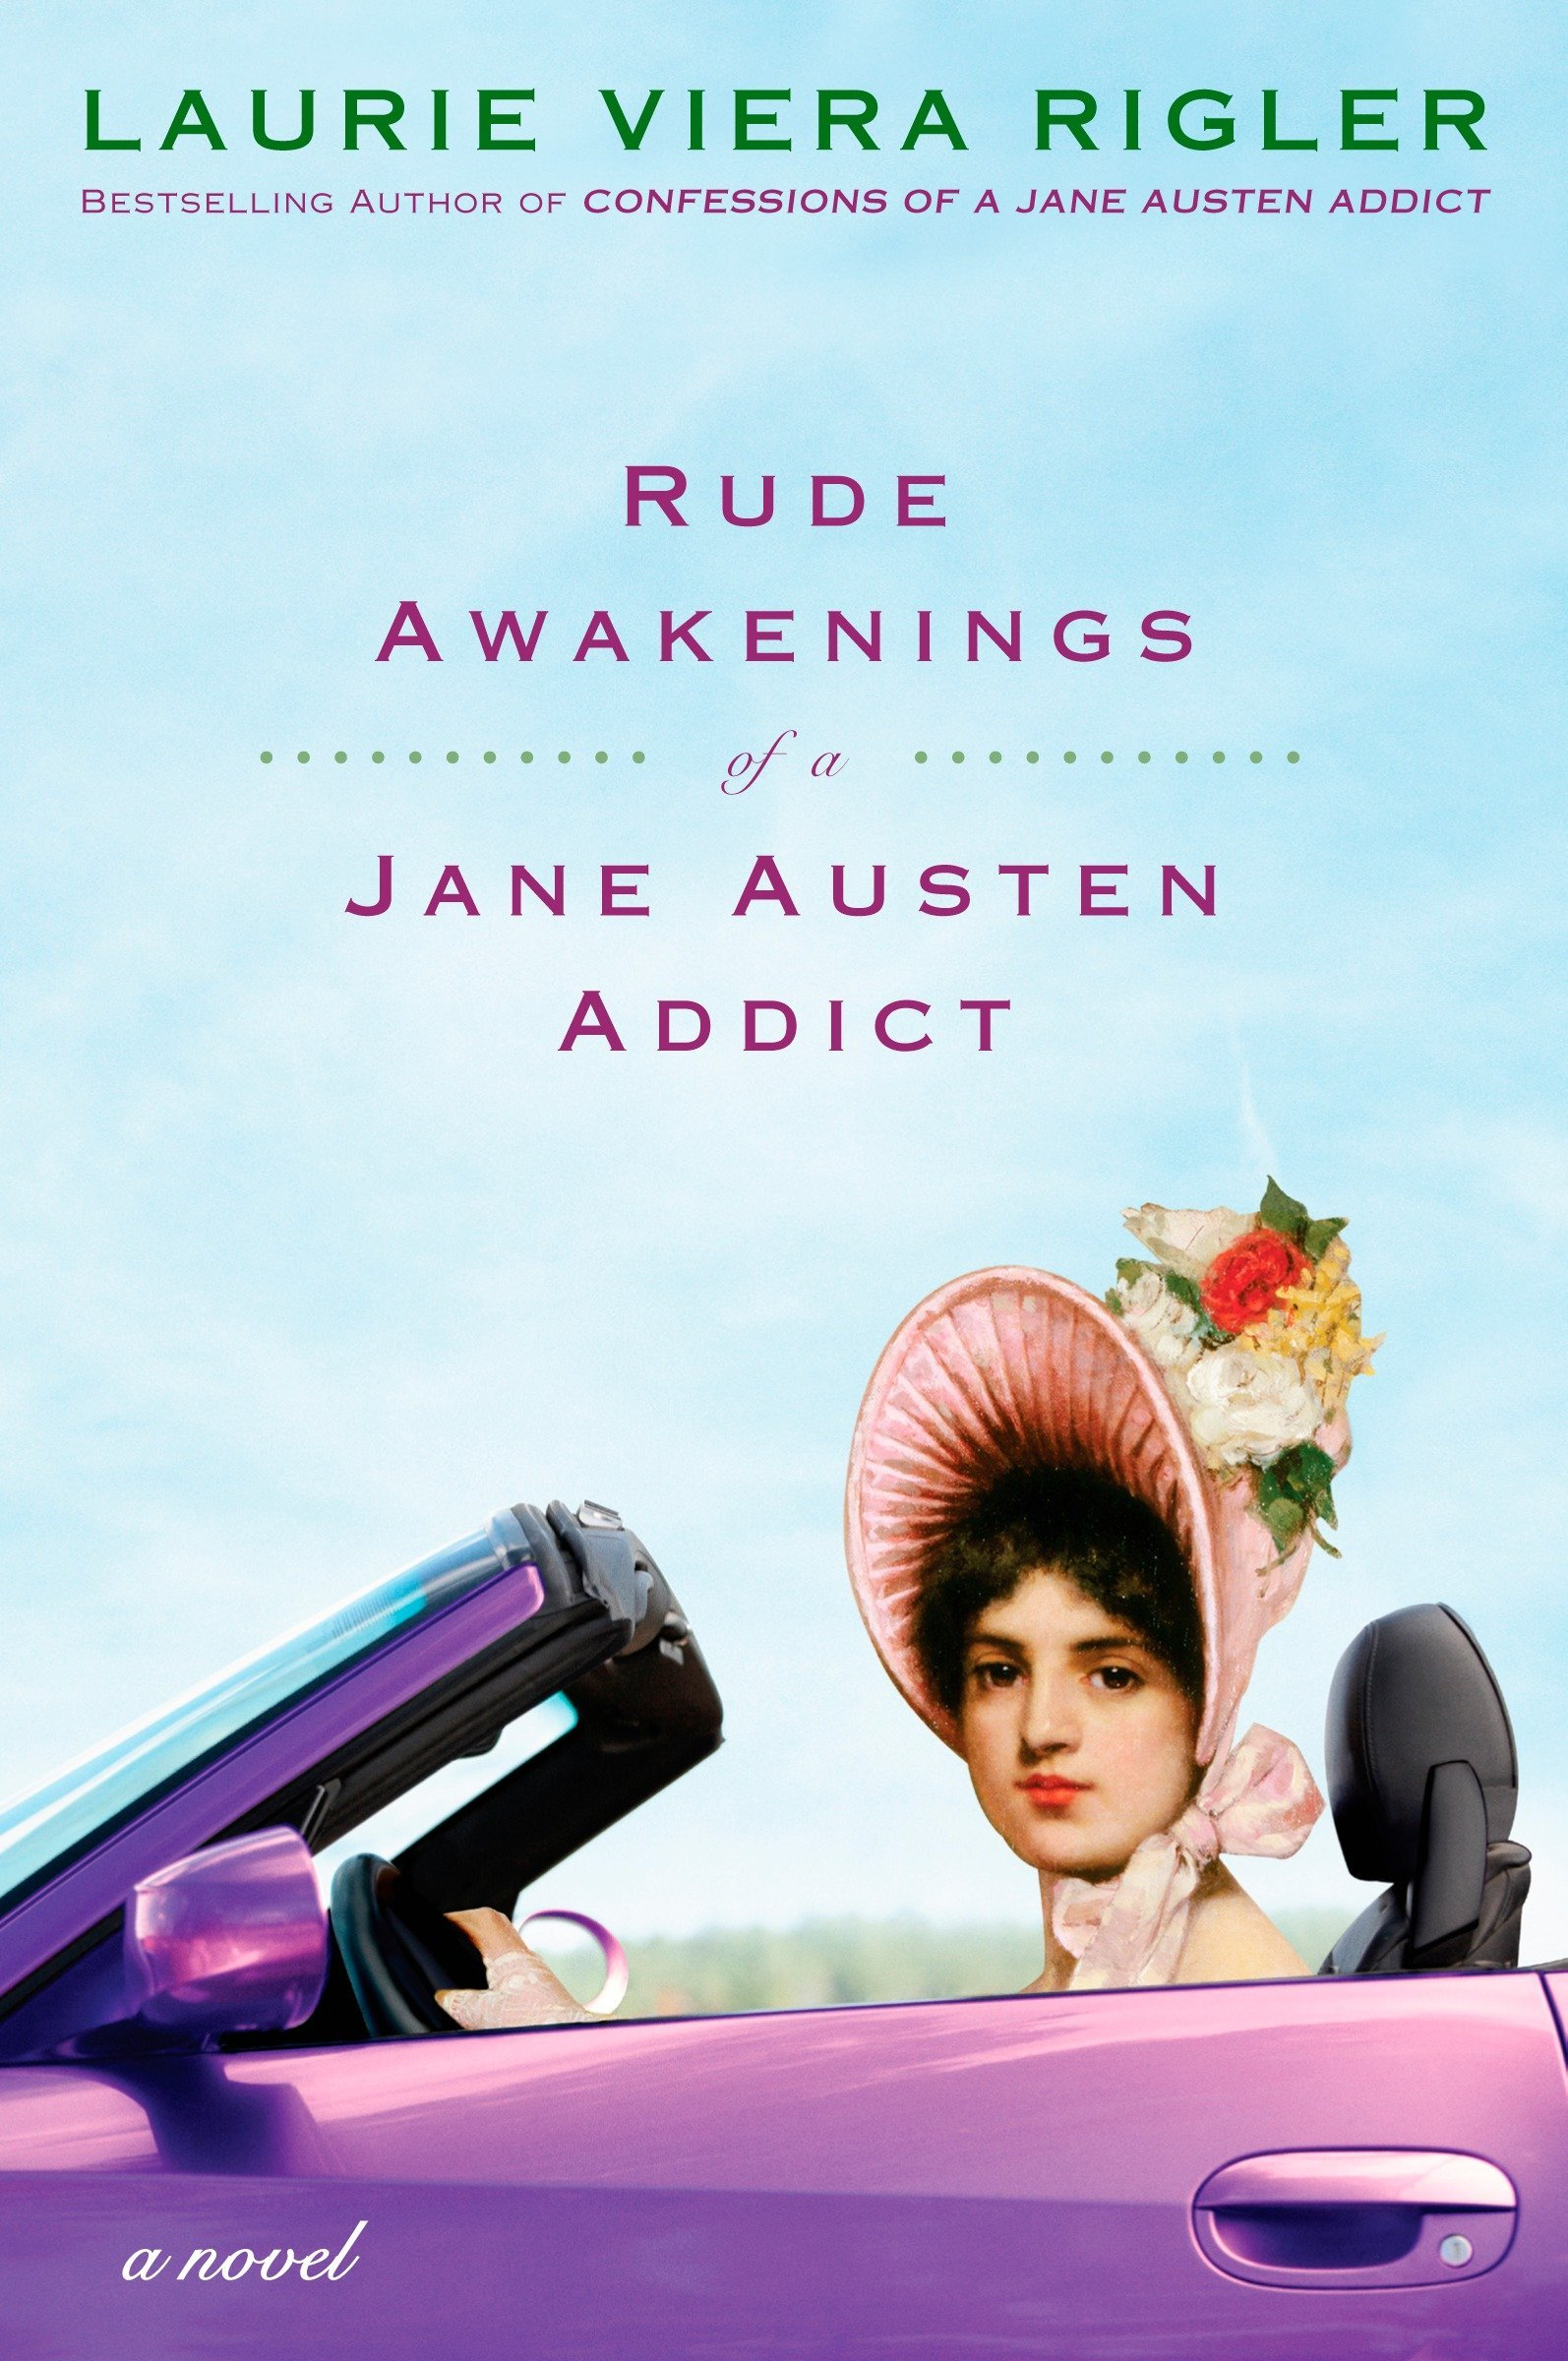 Rude Awakenings of a Jane Austen Addict: A Novel (Jane Austen Addict Series) pdf